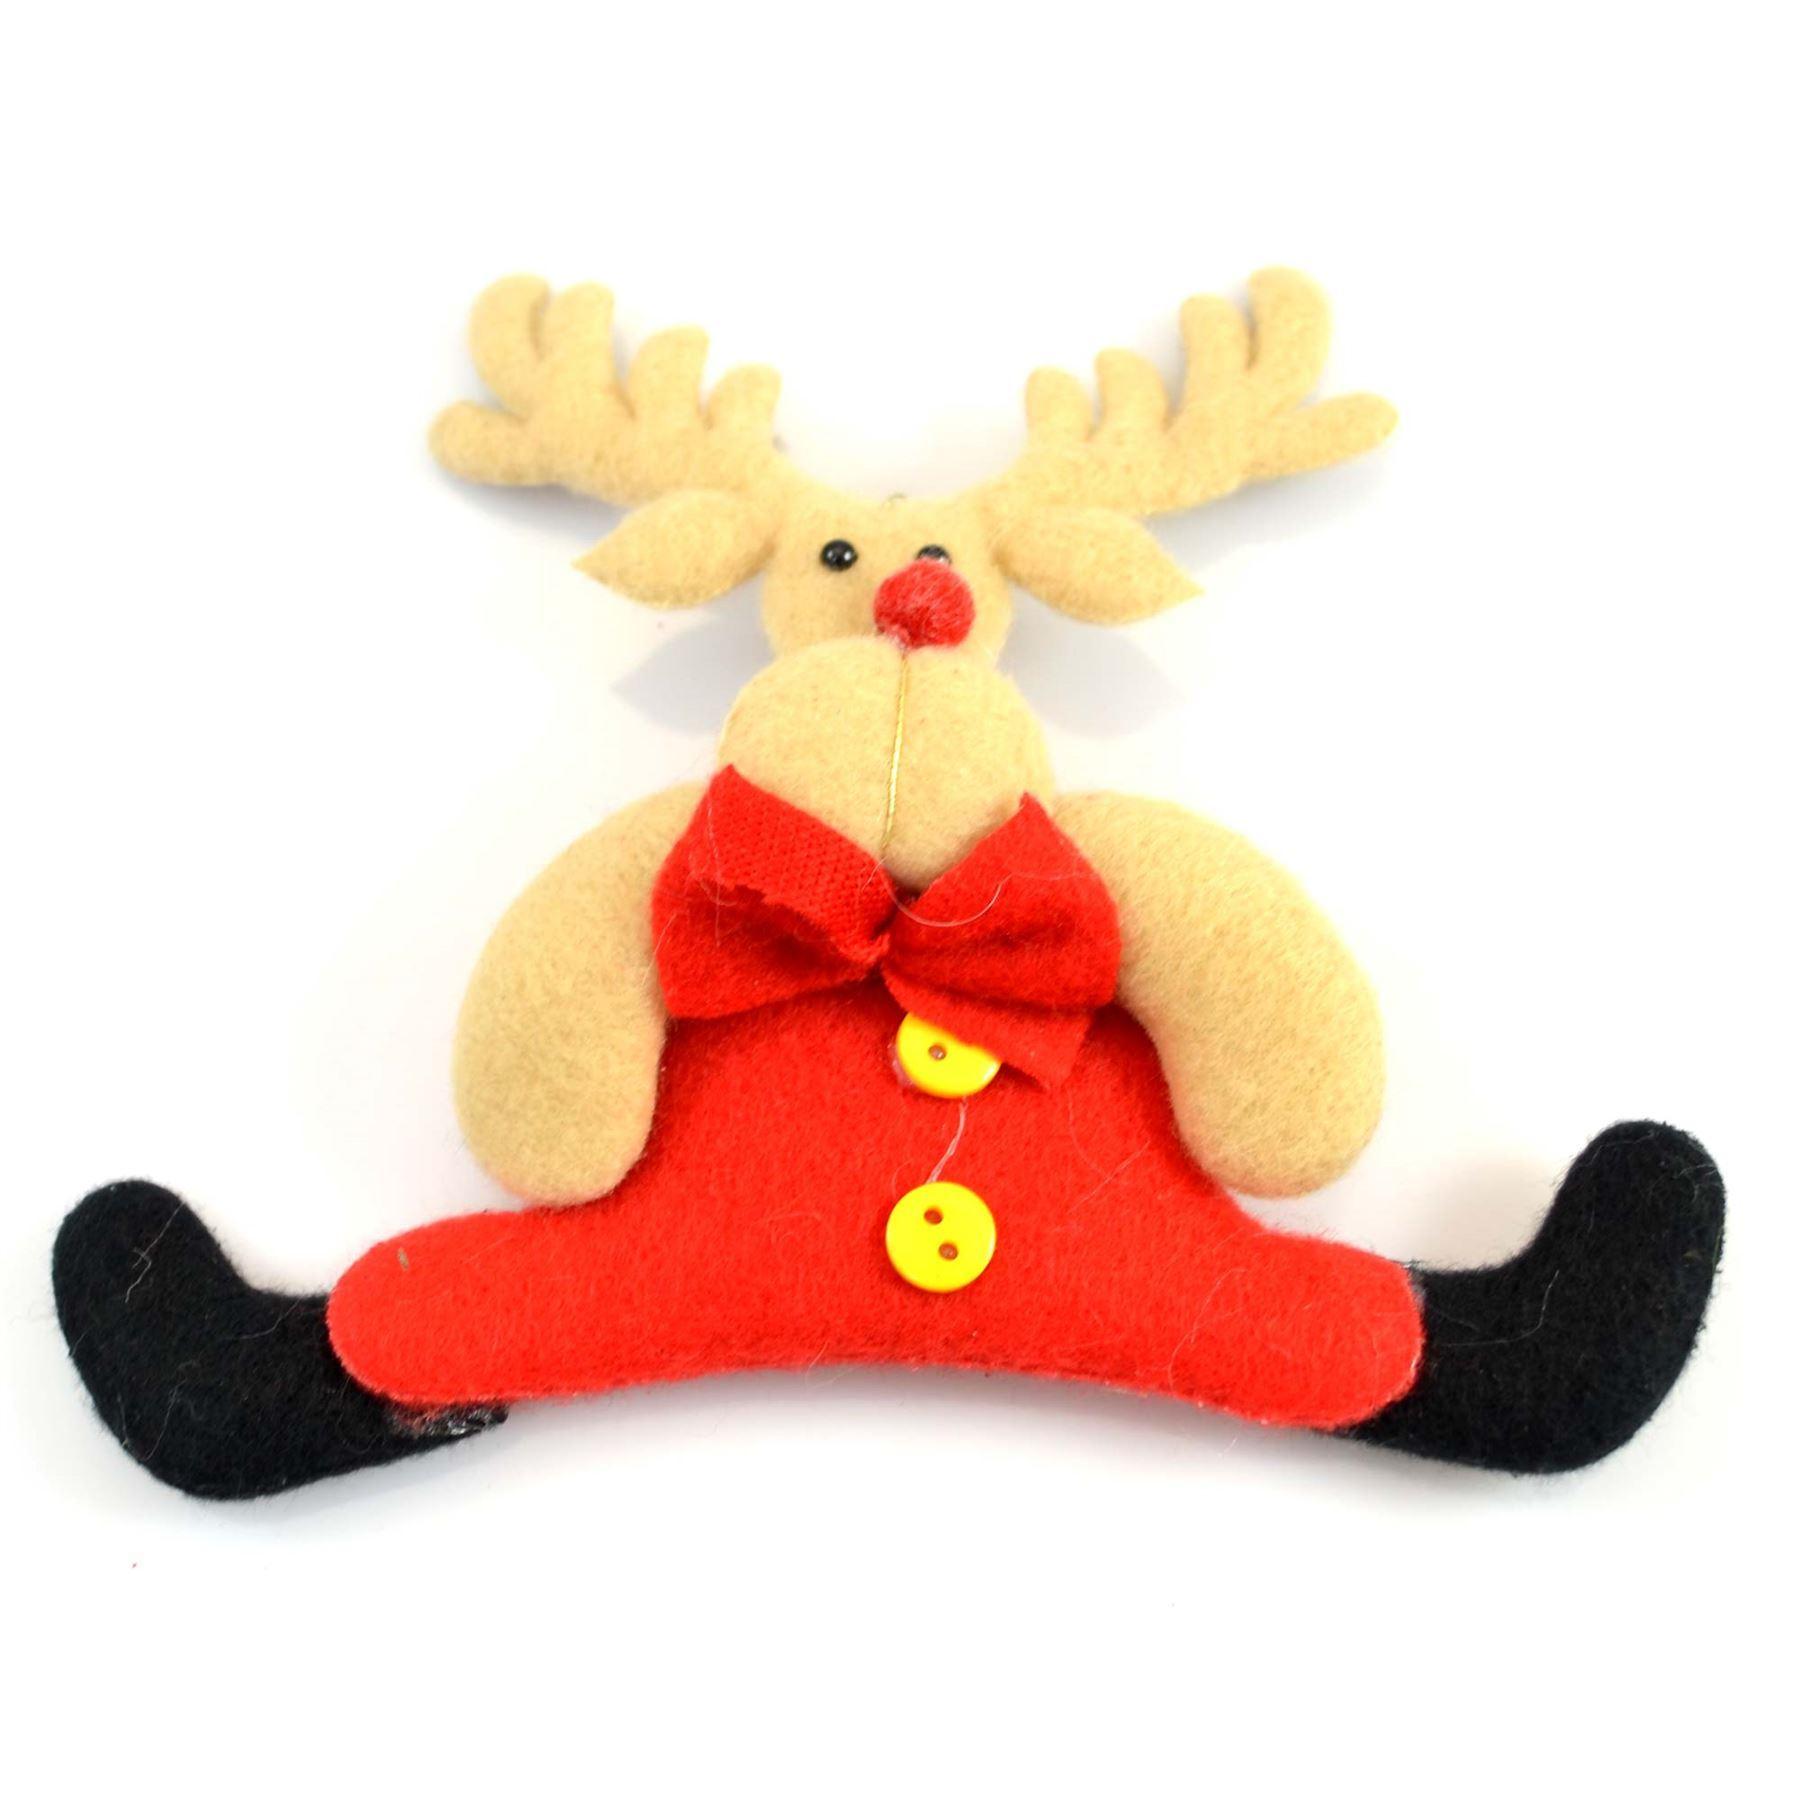 Christmas-Tree-Hanging-Decorations-Glitter-Snowman-Xmas-Beads-Chain-Garland thumbnail 24